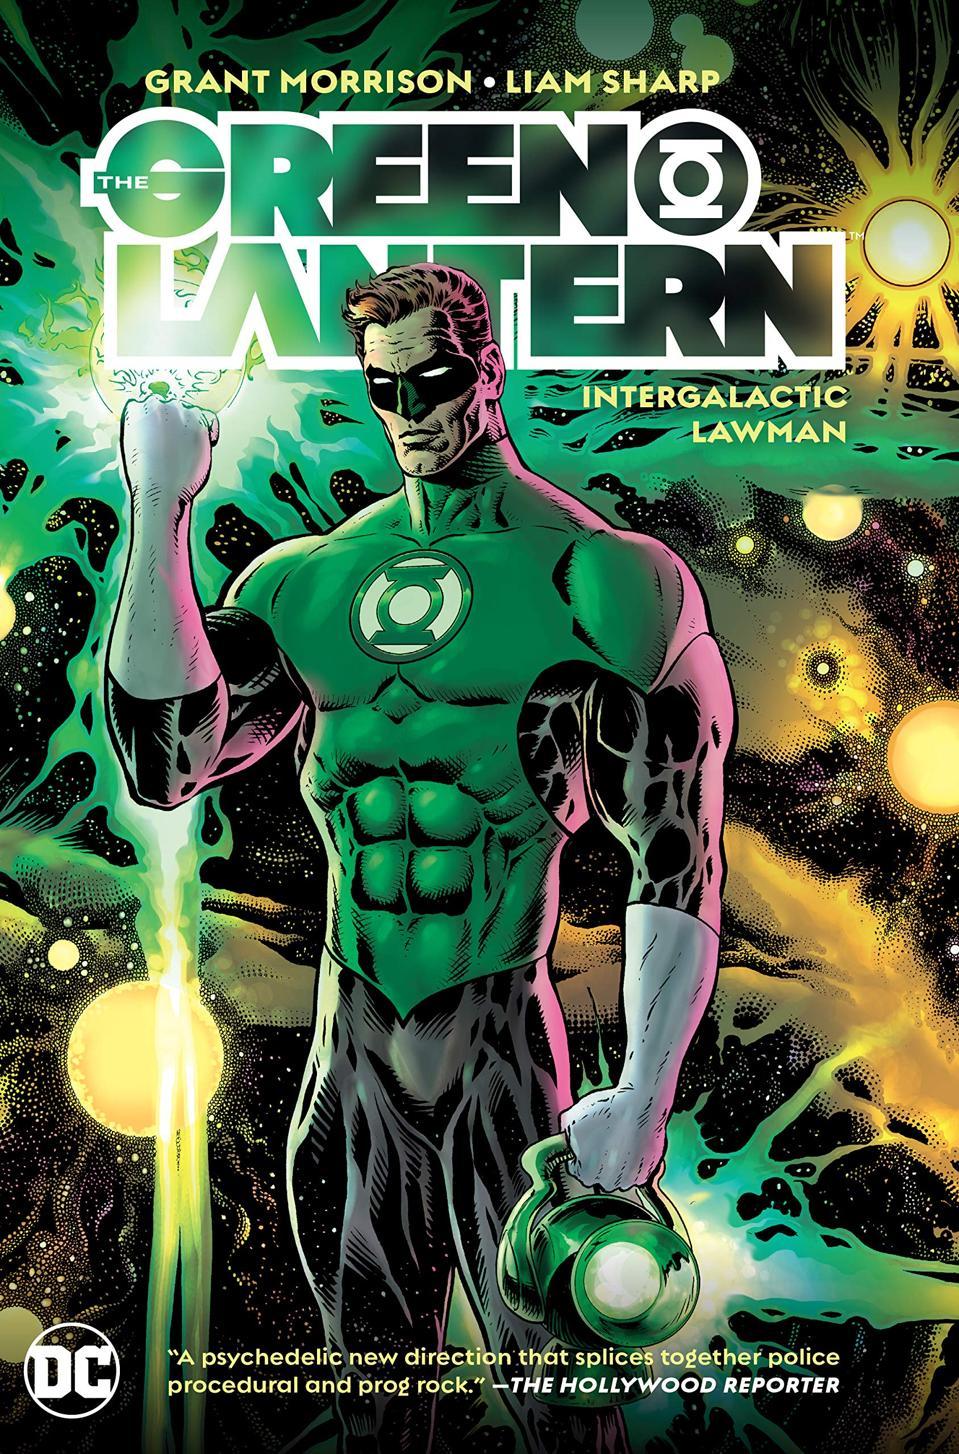 Official image for DC Comics' ″Green Lantern Vol. 1: Intergalactic Lawman″